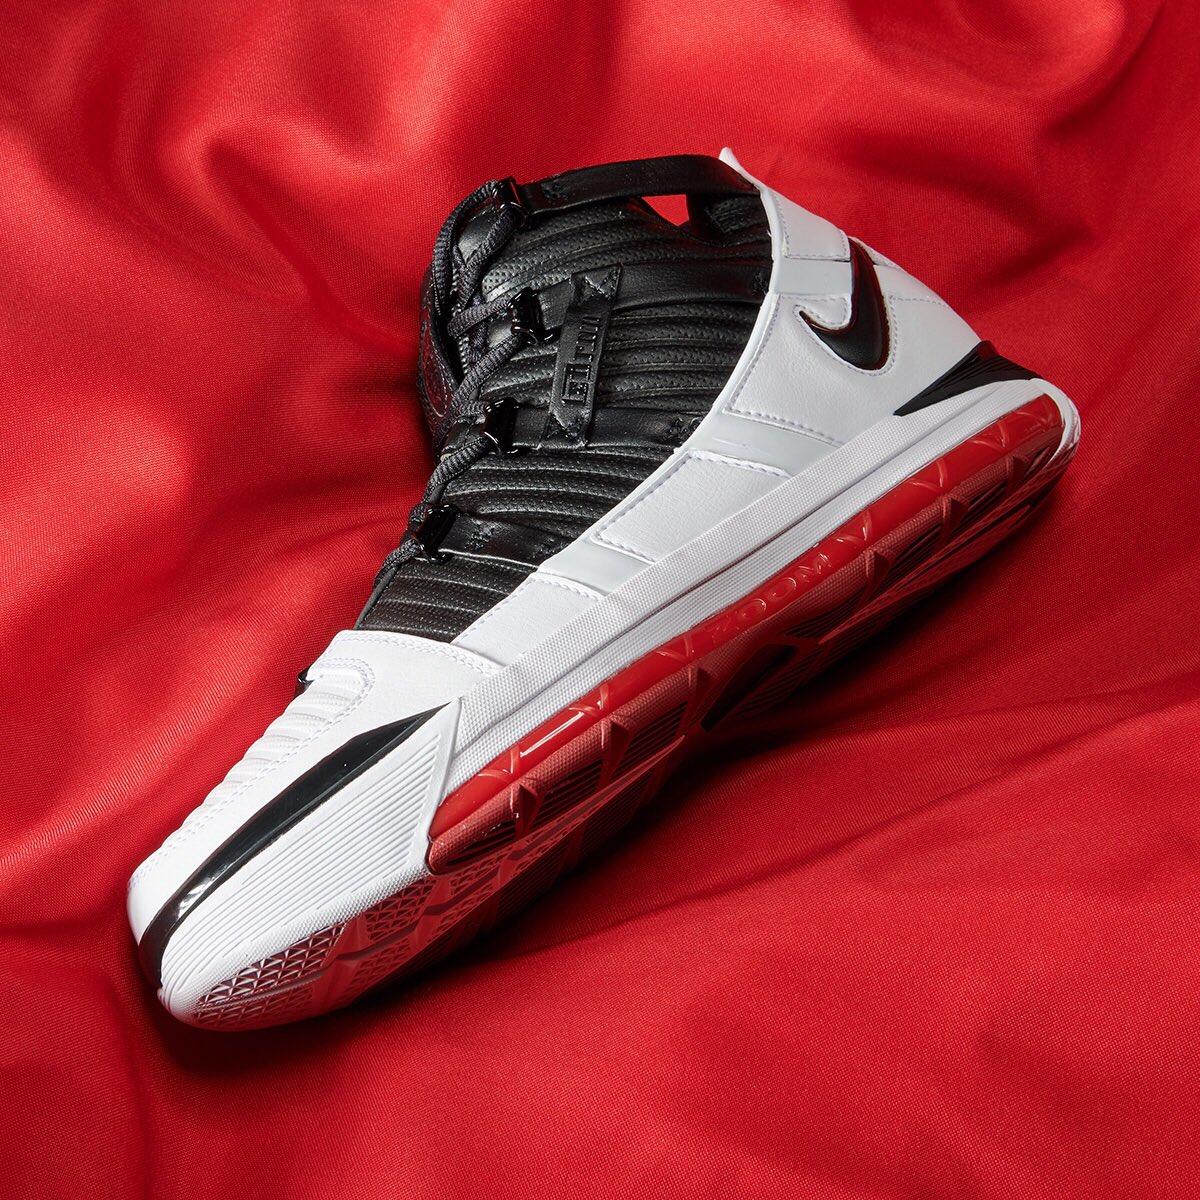 Releasing in 30mins Nike Zoom Lebron 3